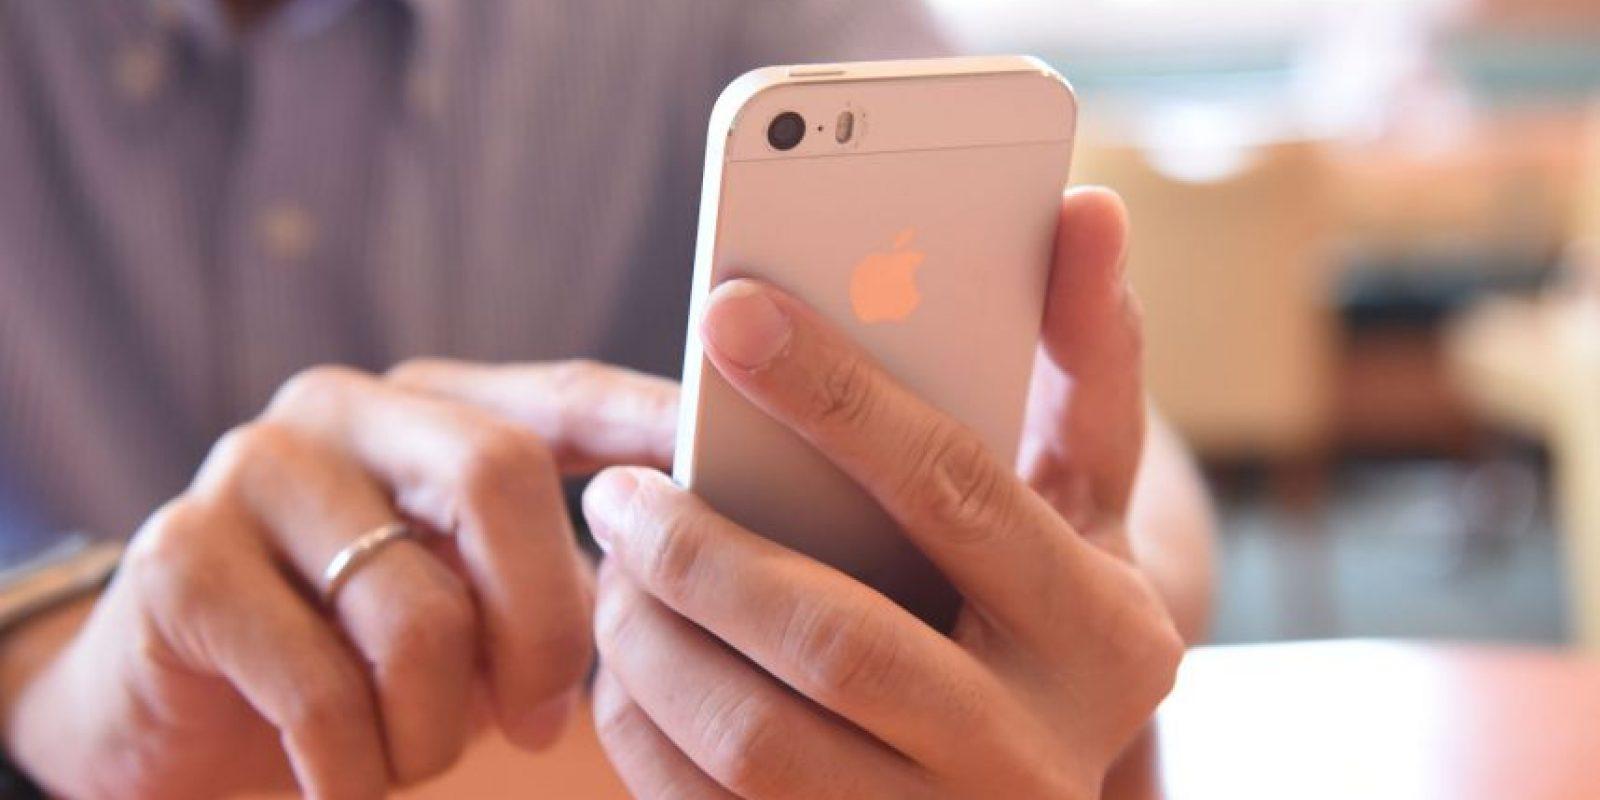 2. Enviar videos ilegales. Foto:Getty Images